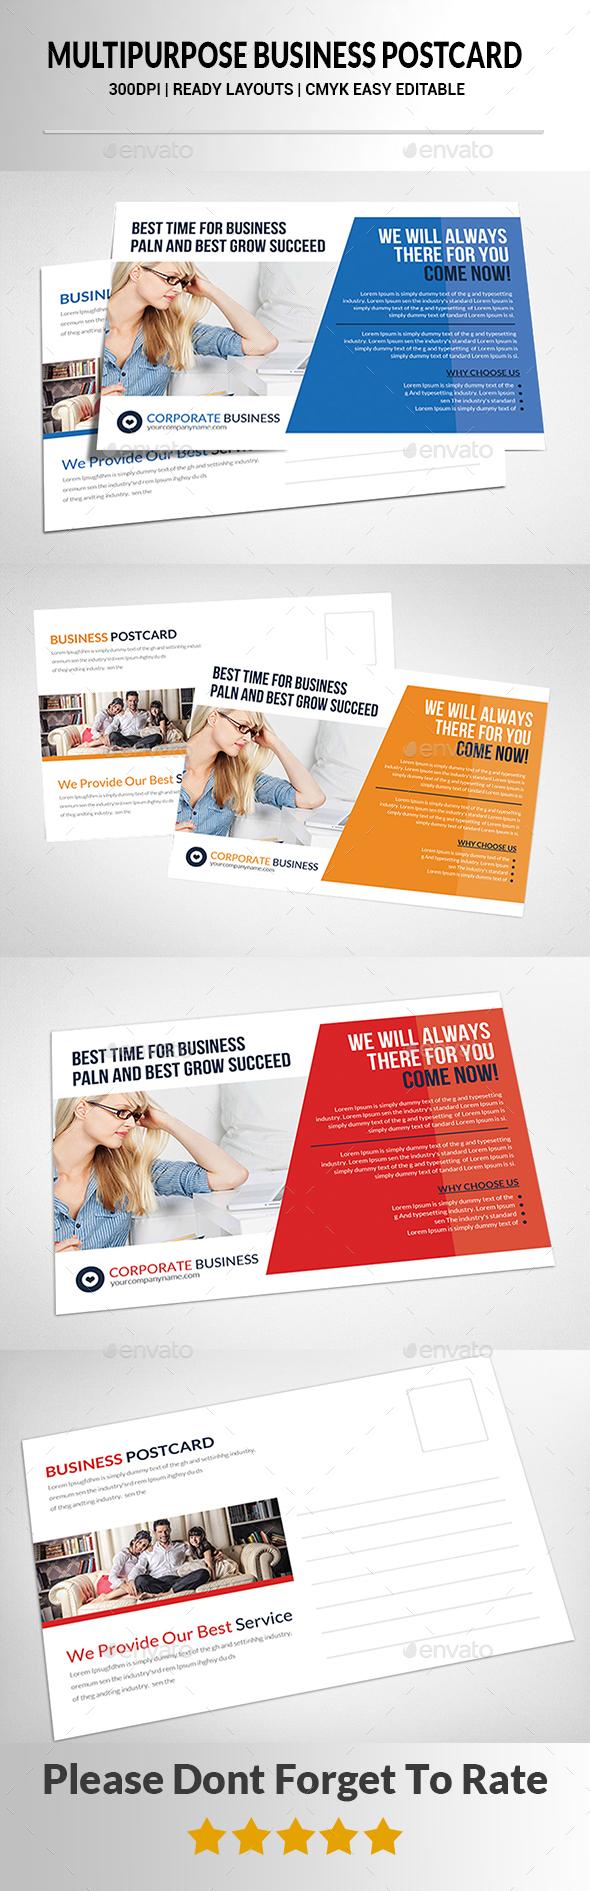 Multipurpose Business Postcard - Cards & Invites Print Templates